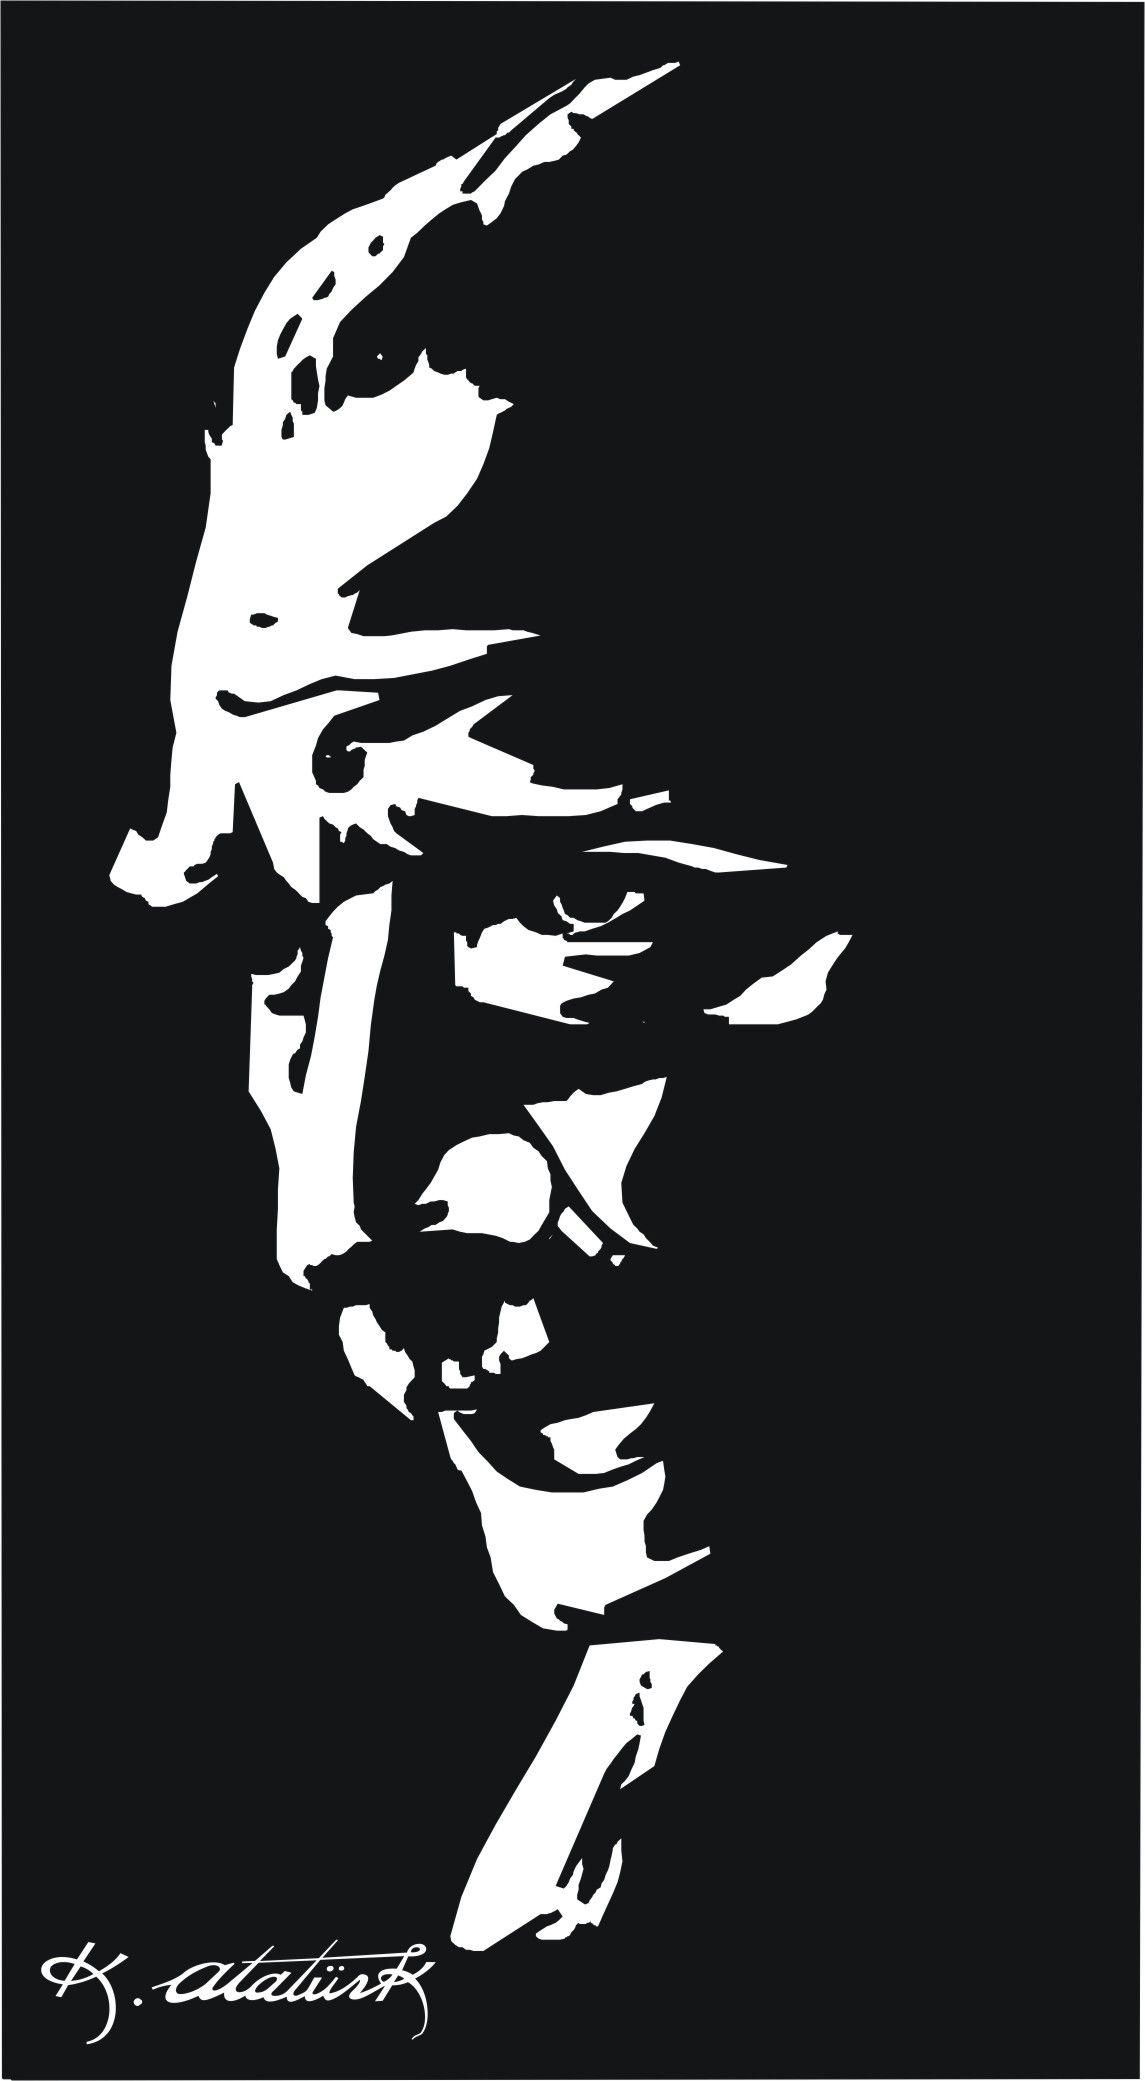 1mustafa Kemal Ataturk Fotograflari Yuksek Cozunurluk 27 Jpg 1145 2081 Resim Gorsel Sanatlar Tuval Resimleri